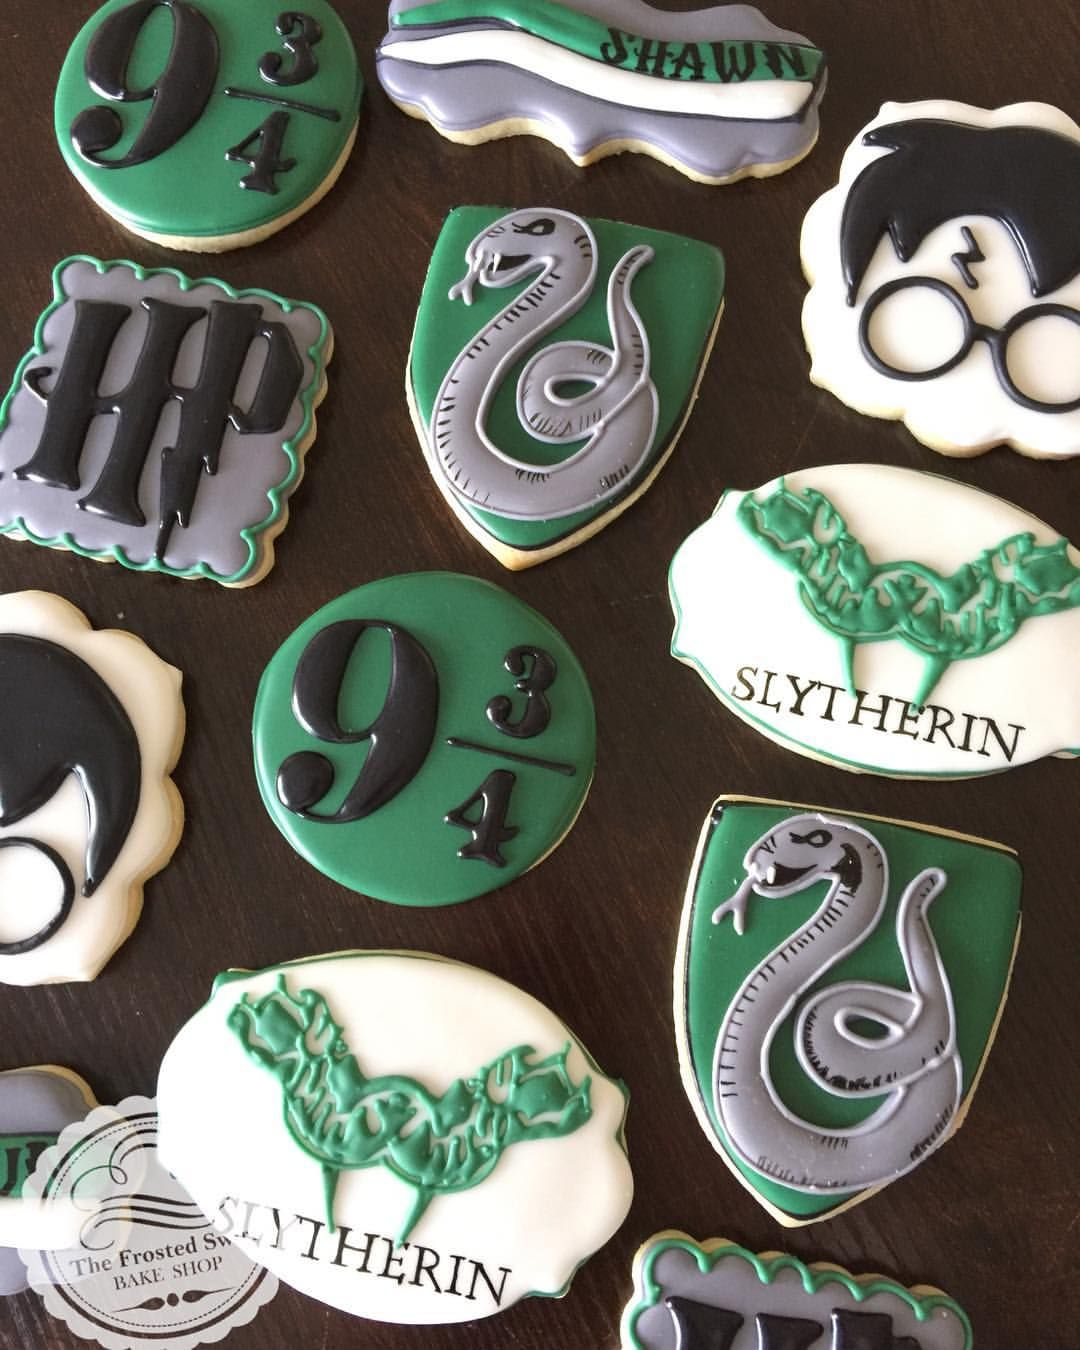 Slytherin! Happy Birthday Shawn! 🐍